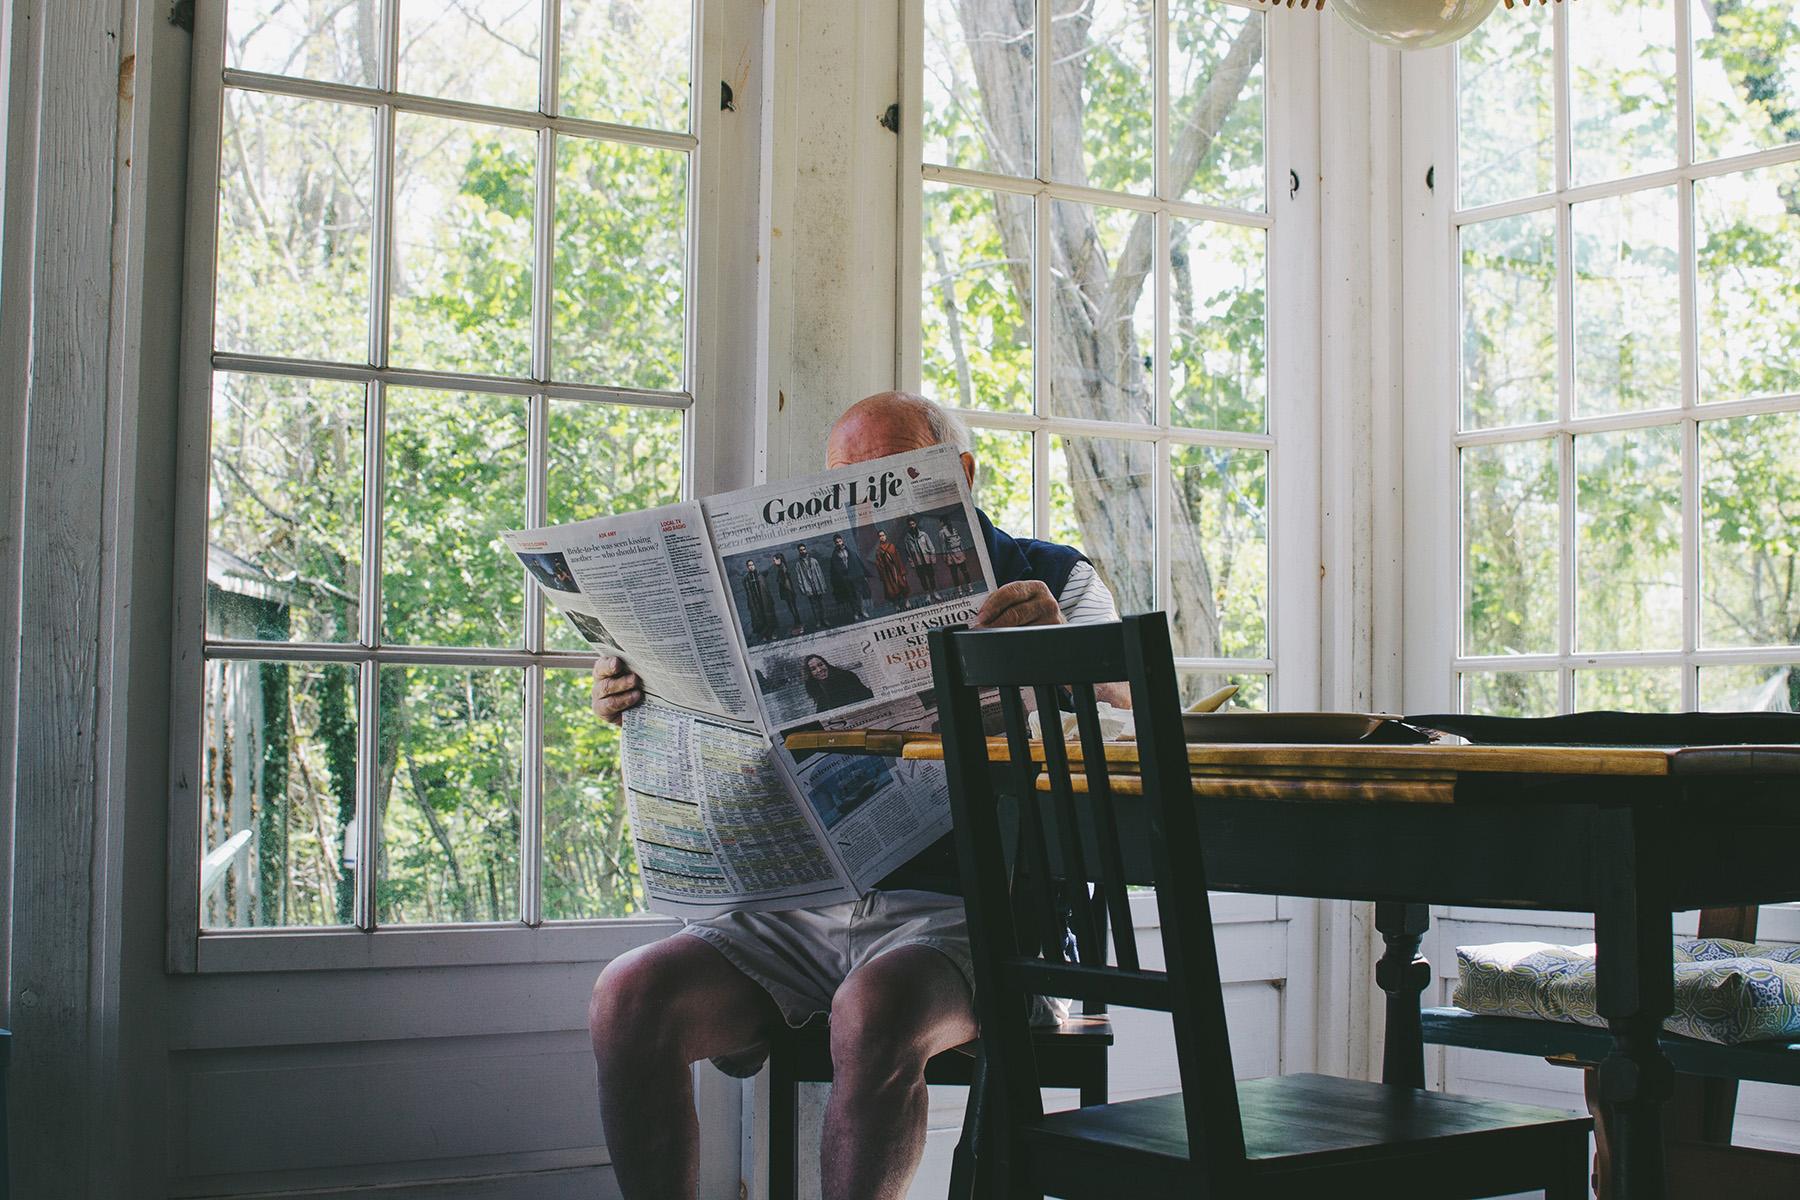 Elderly man reading a newspaper